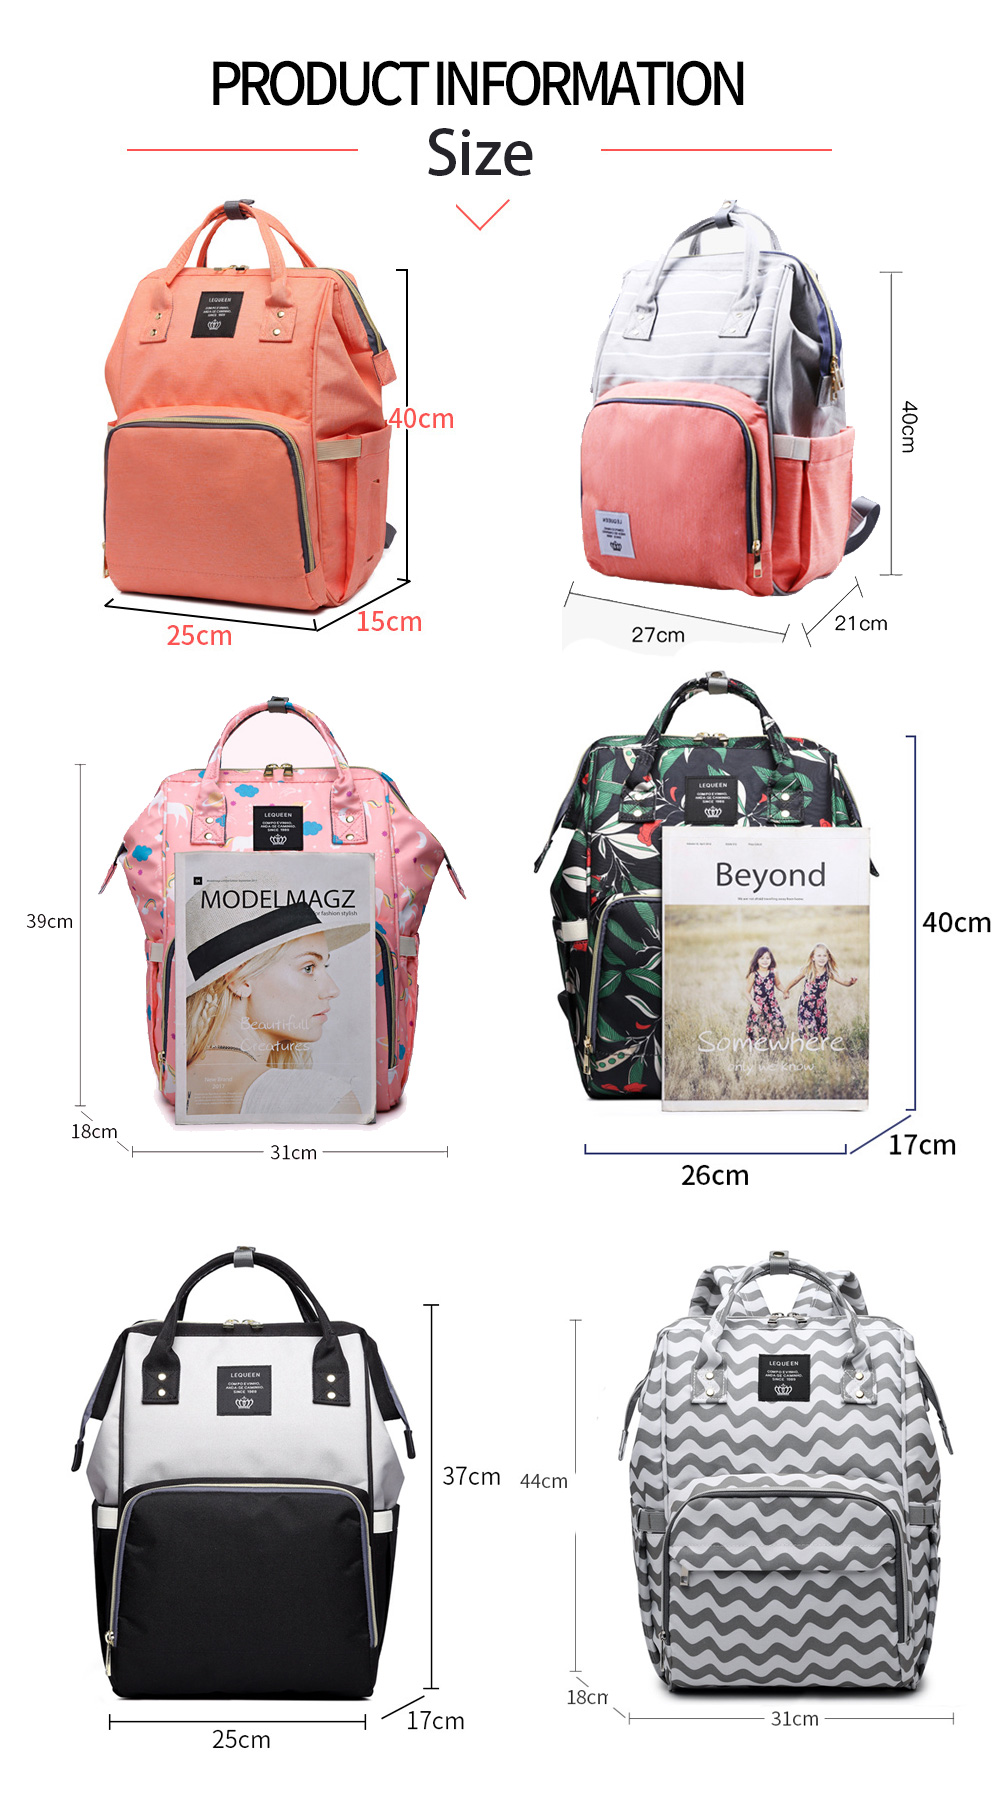 HTB1wYZ8XojrK1RkHFNRq6ySvpXab Fashion Mummy Maternity Nappy Bag Large Capacity Baby Bag Travel Backpack Nursing Bag for Baby Care Nappy Hand Bag